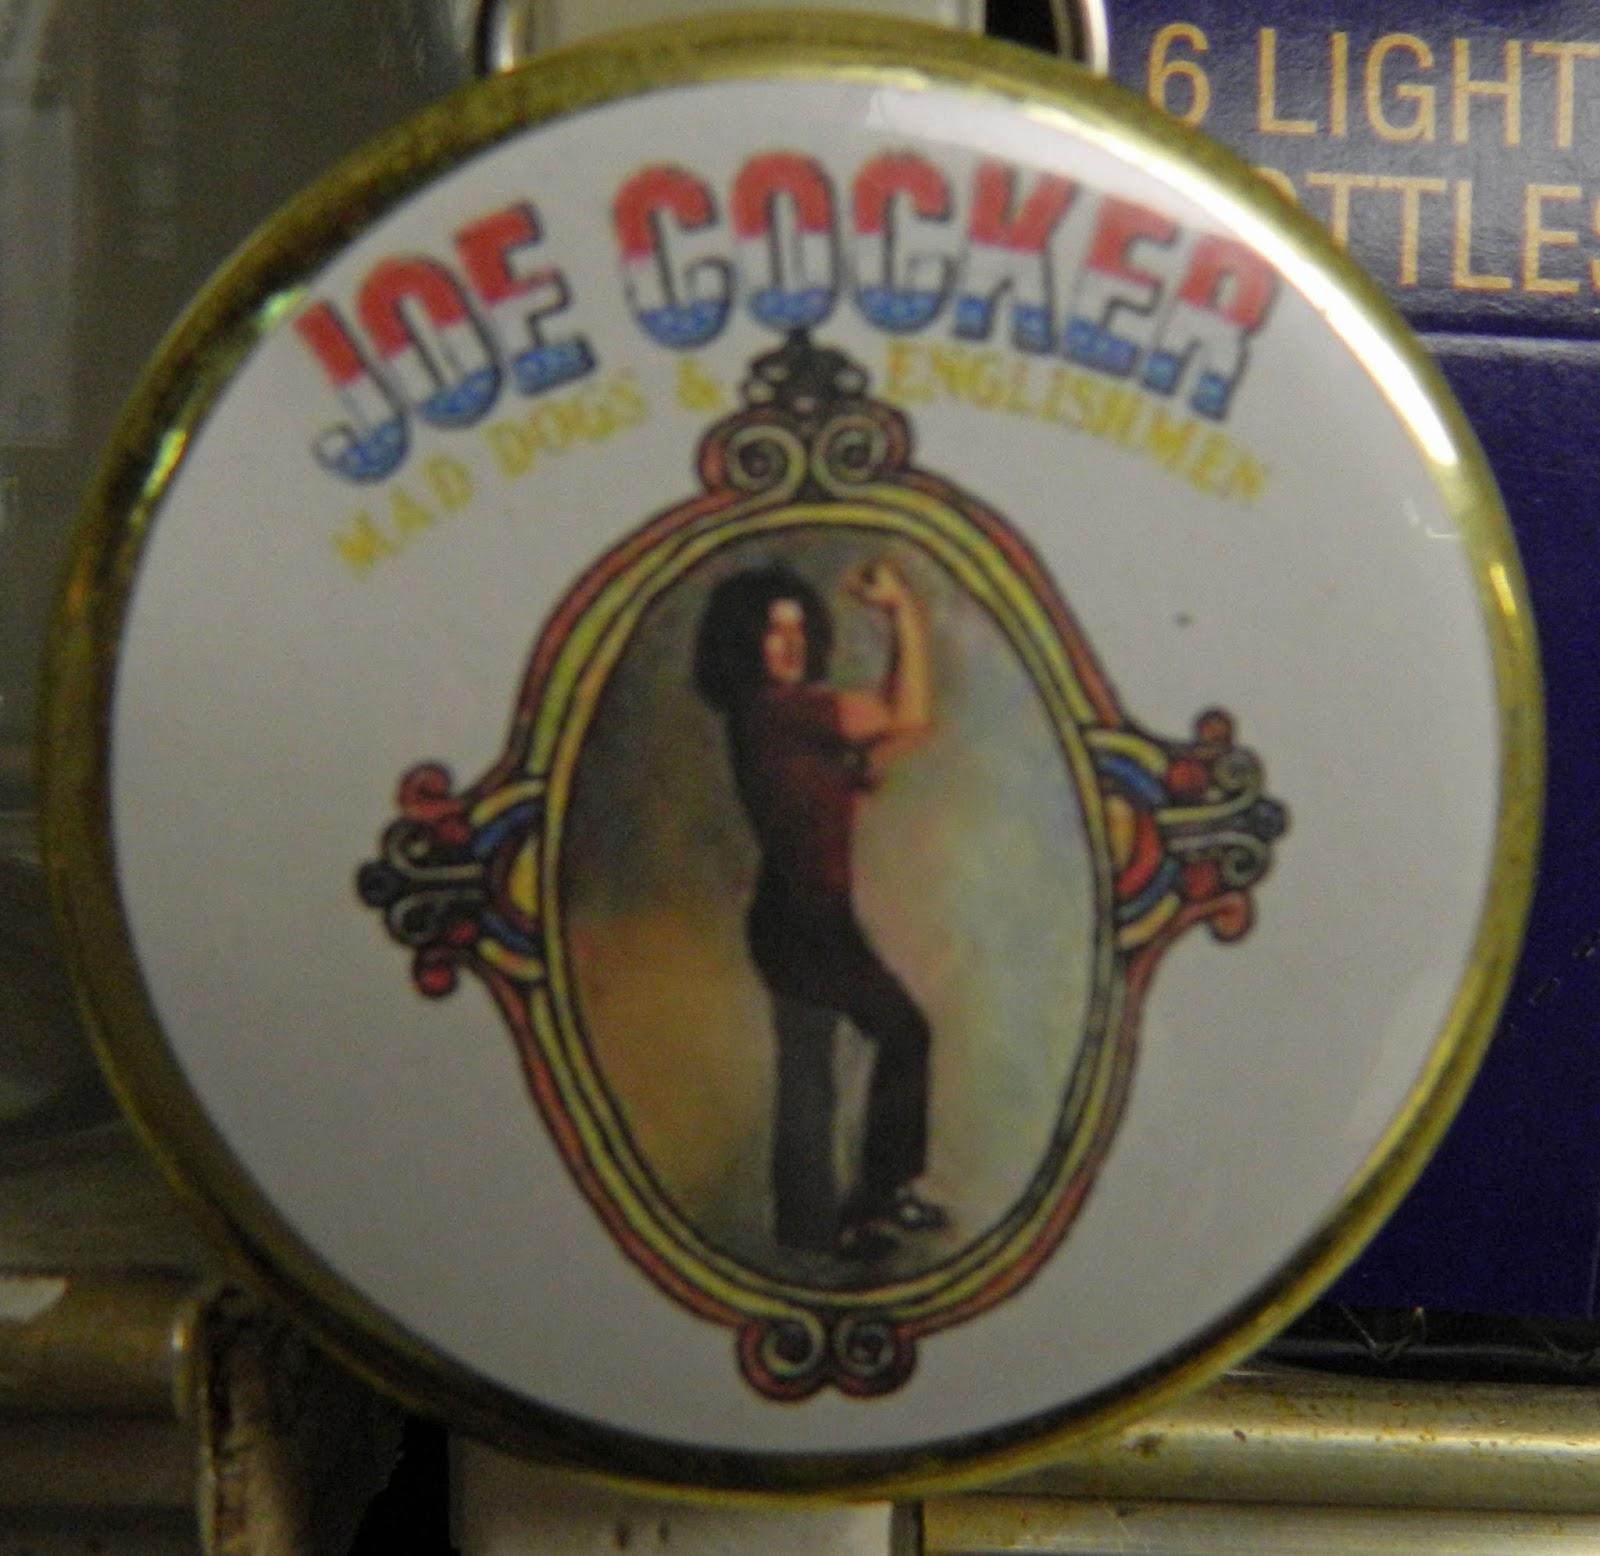 Joe Cocker Mad Dogs Englishmen